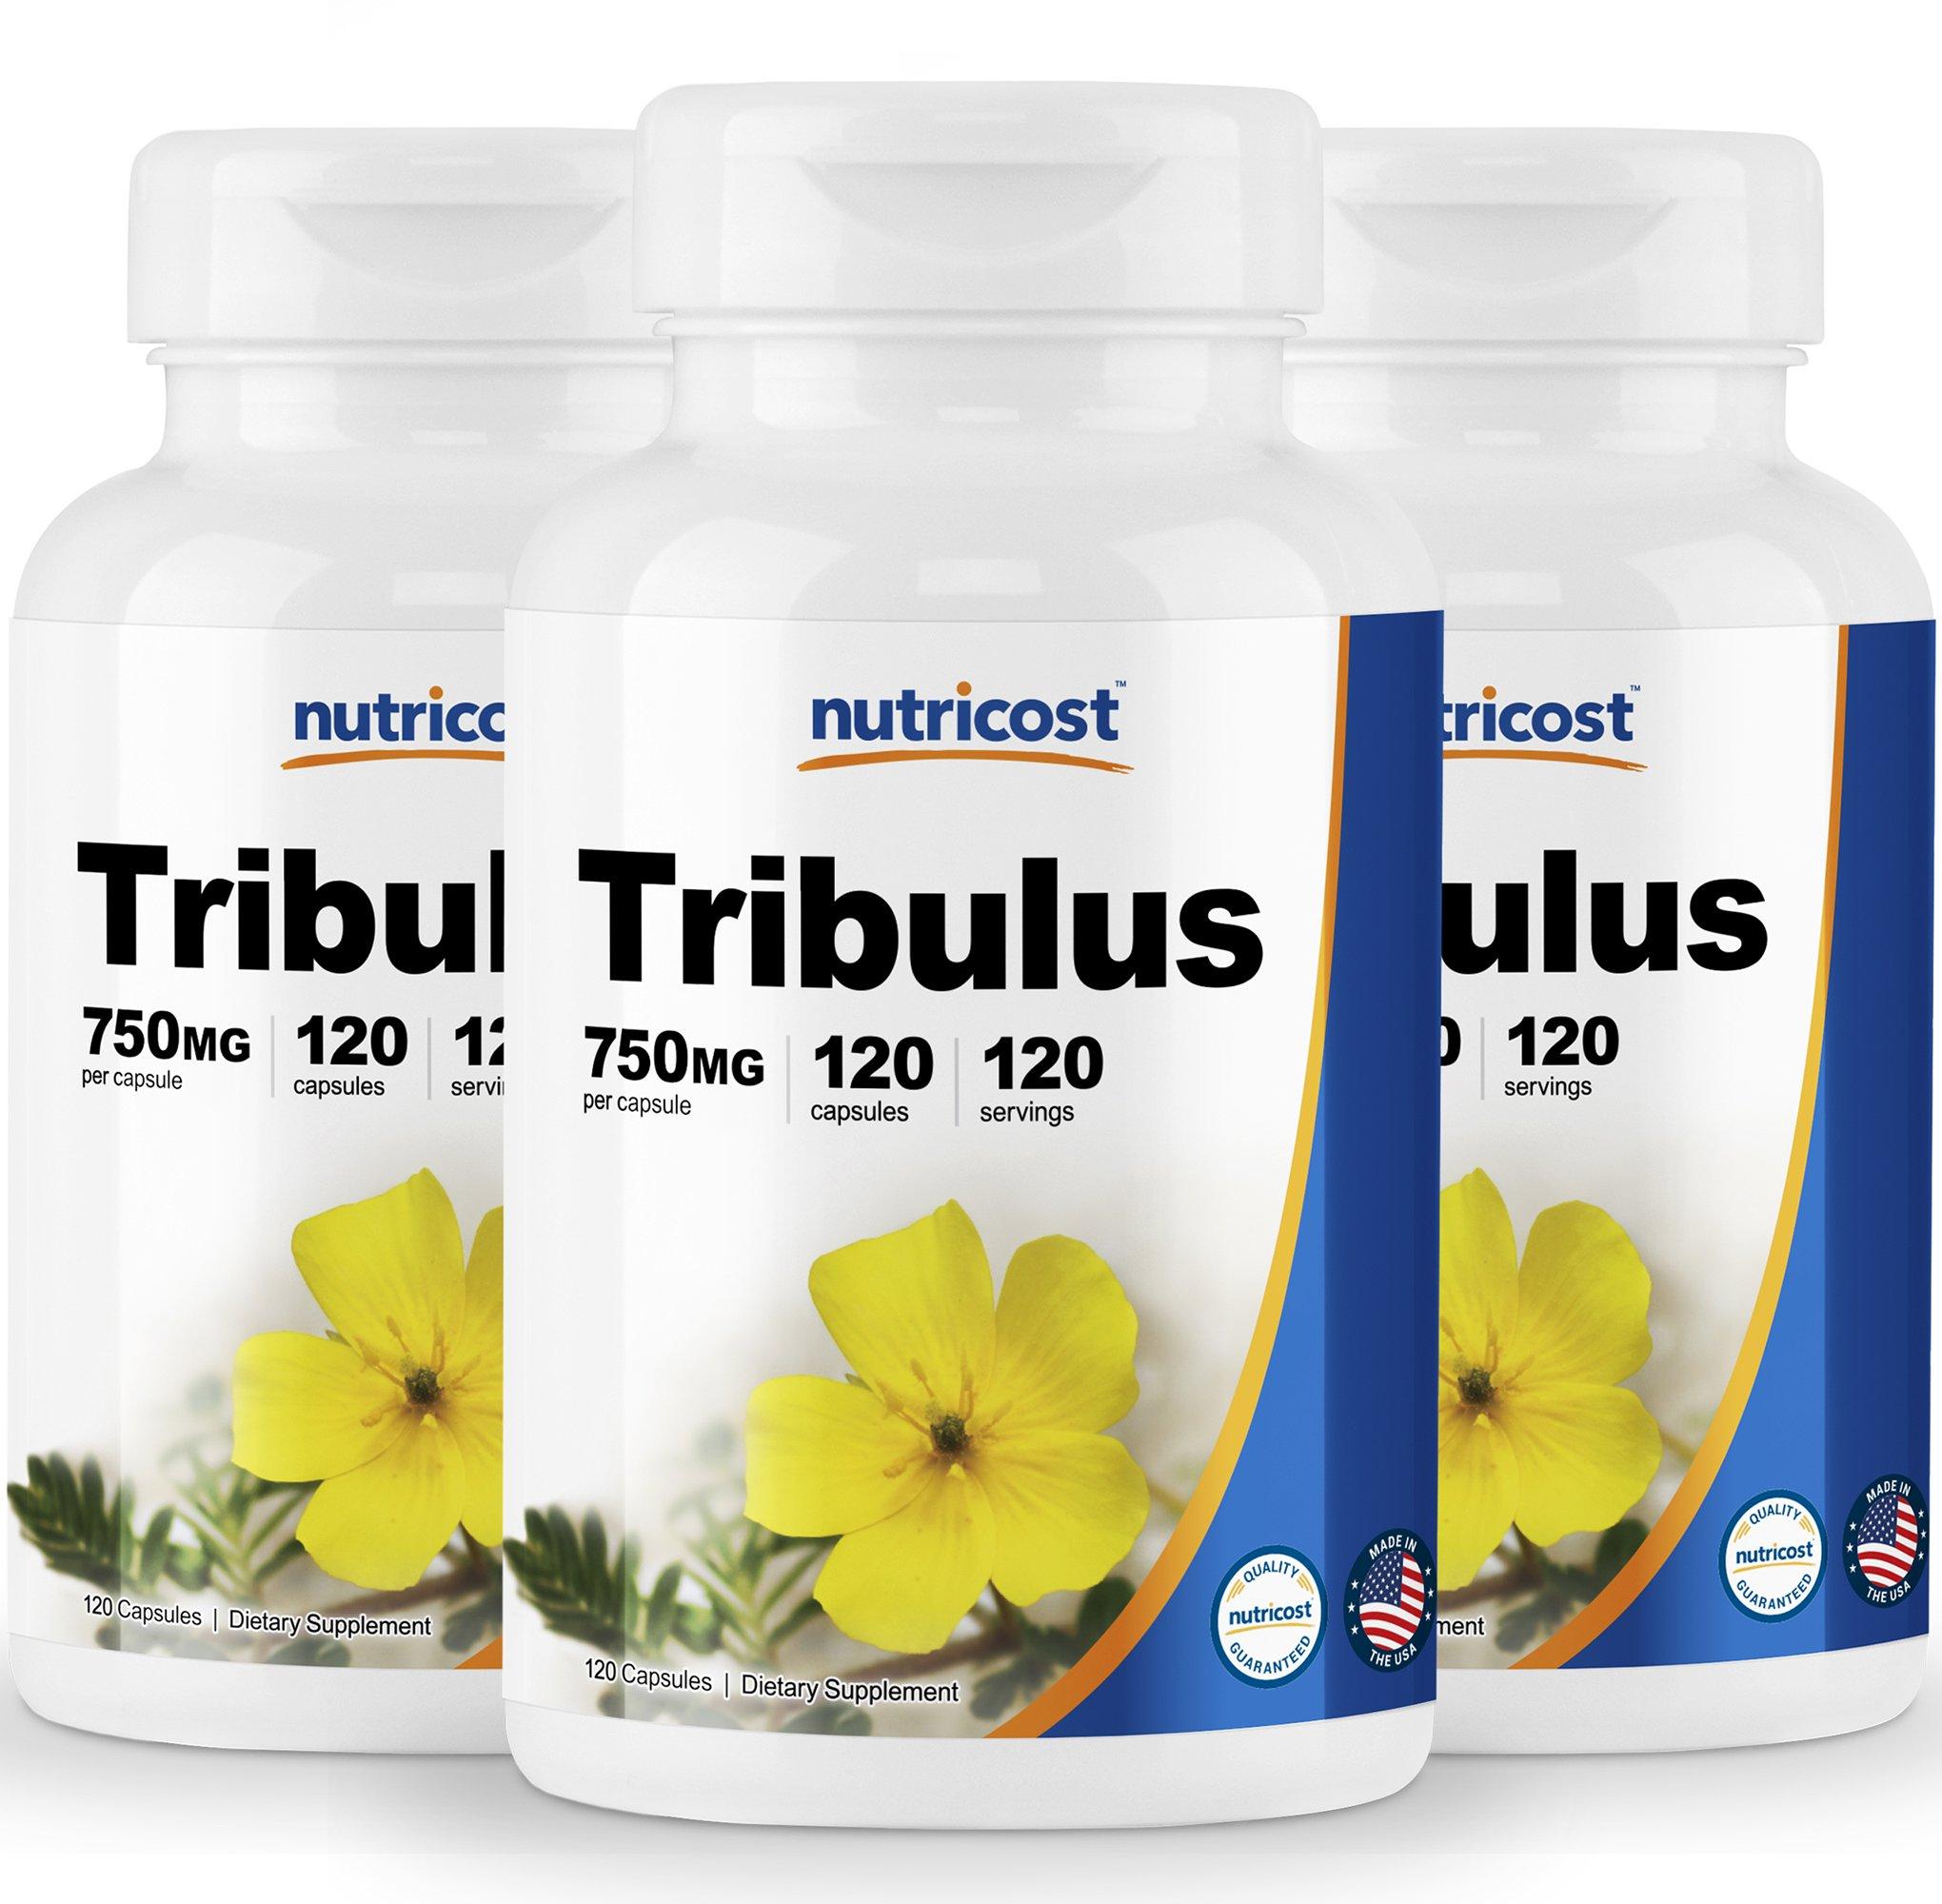 Nutricost Tribulus Terrestris Extract 750mg, 120 Capsules (3 Bottles) - Testosterone, Strength, Libido